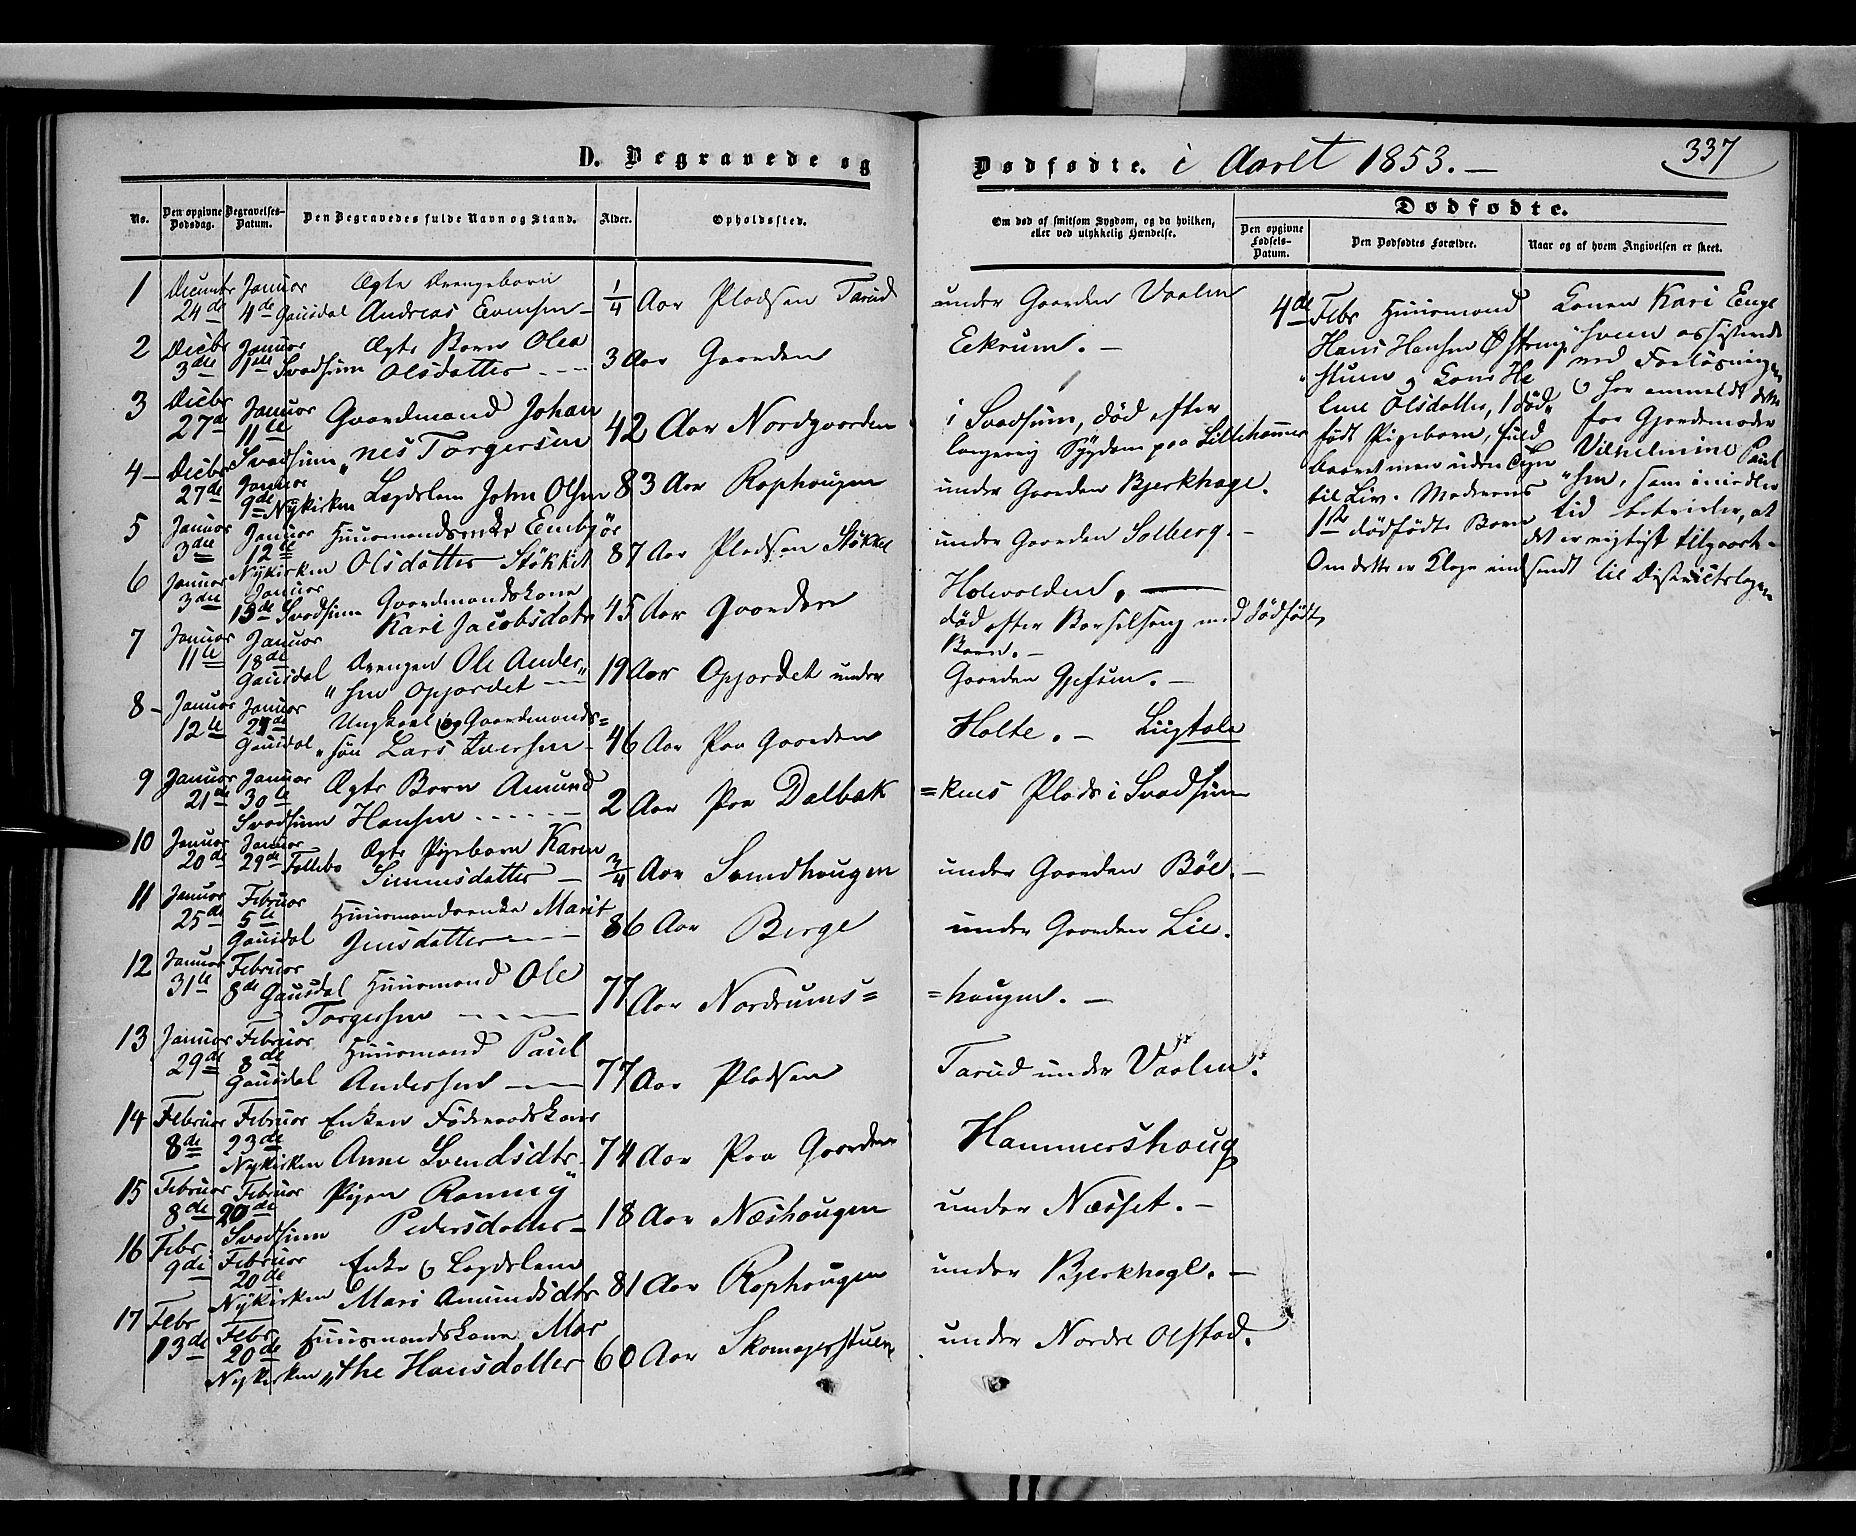 SAH, Gausdal prestekontor, Ministerialbok nr. 8, 1850-1861, s. 337